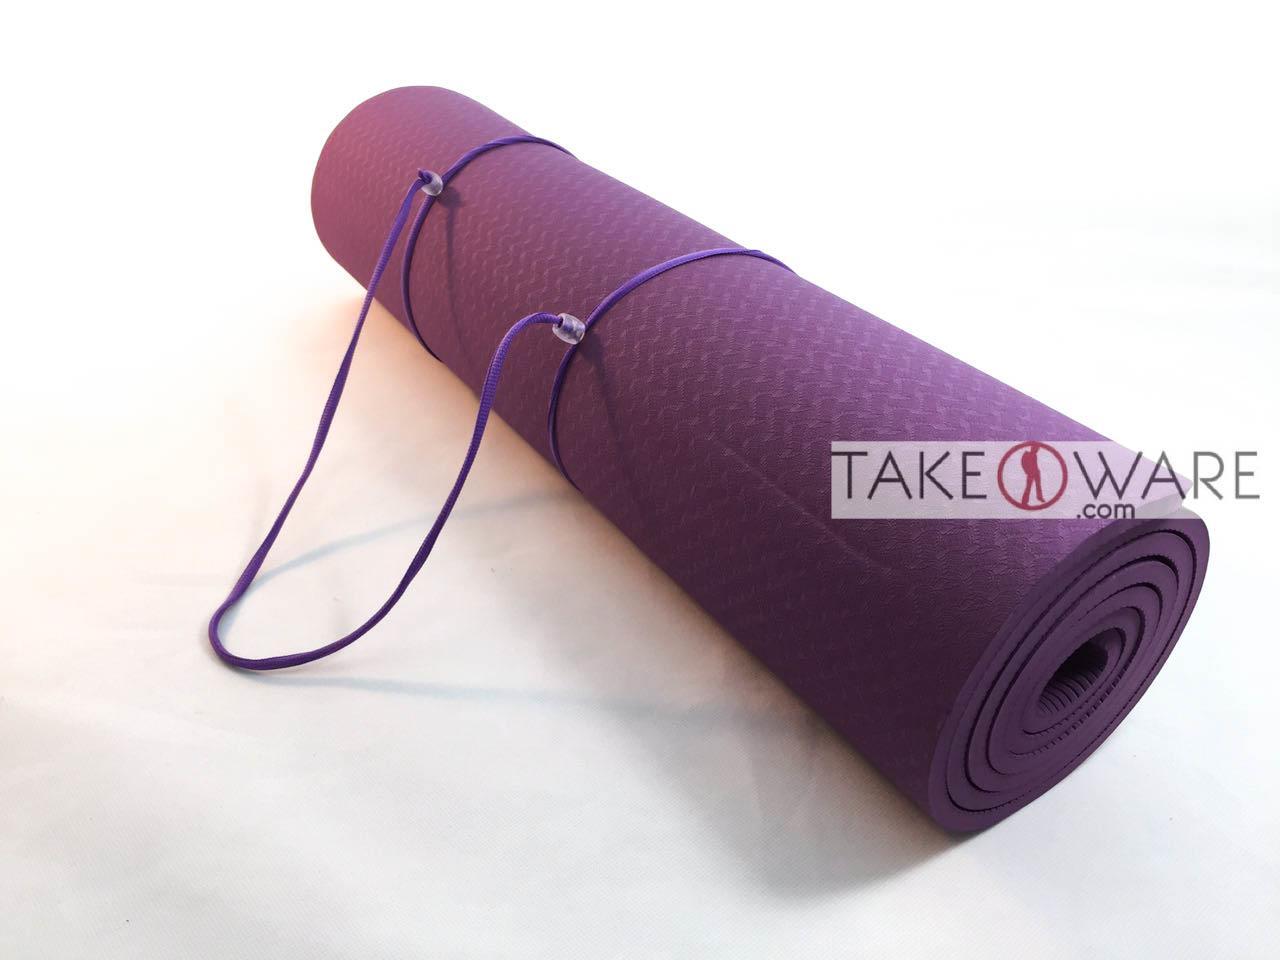 Tpe Yoga Mat 183 X 61 Cm Thickness End 3 26 2019 3 15 Pm